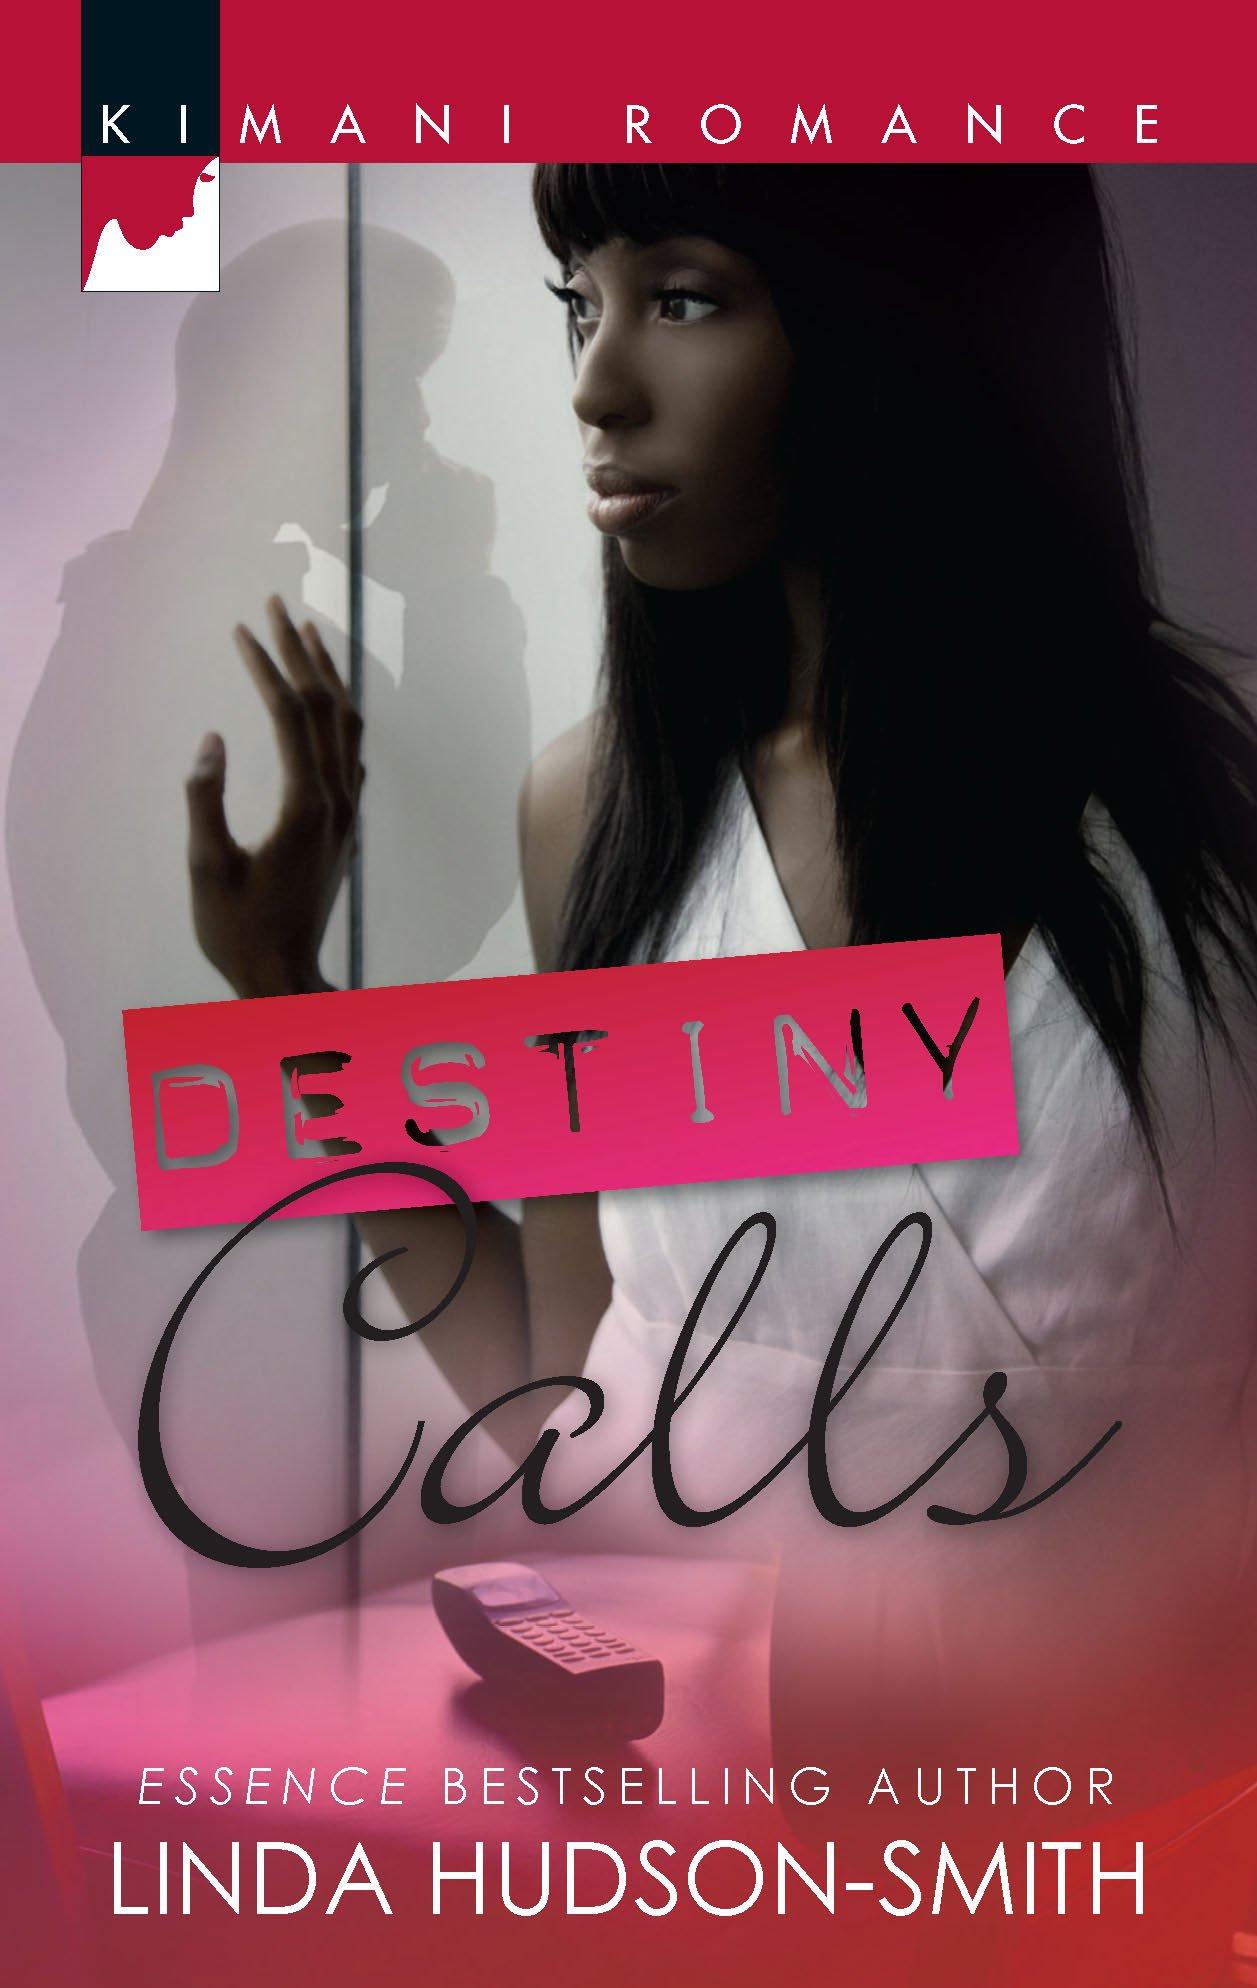 Read Online Destiny Calls (Kimani Romance) pdf